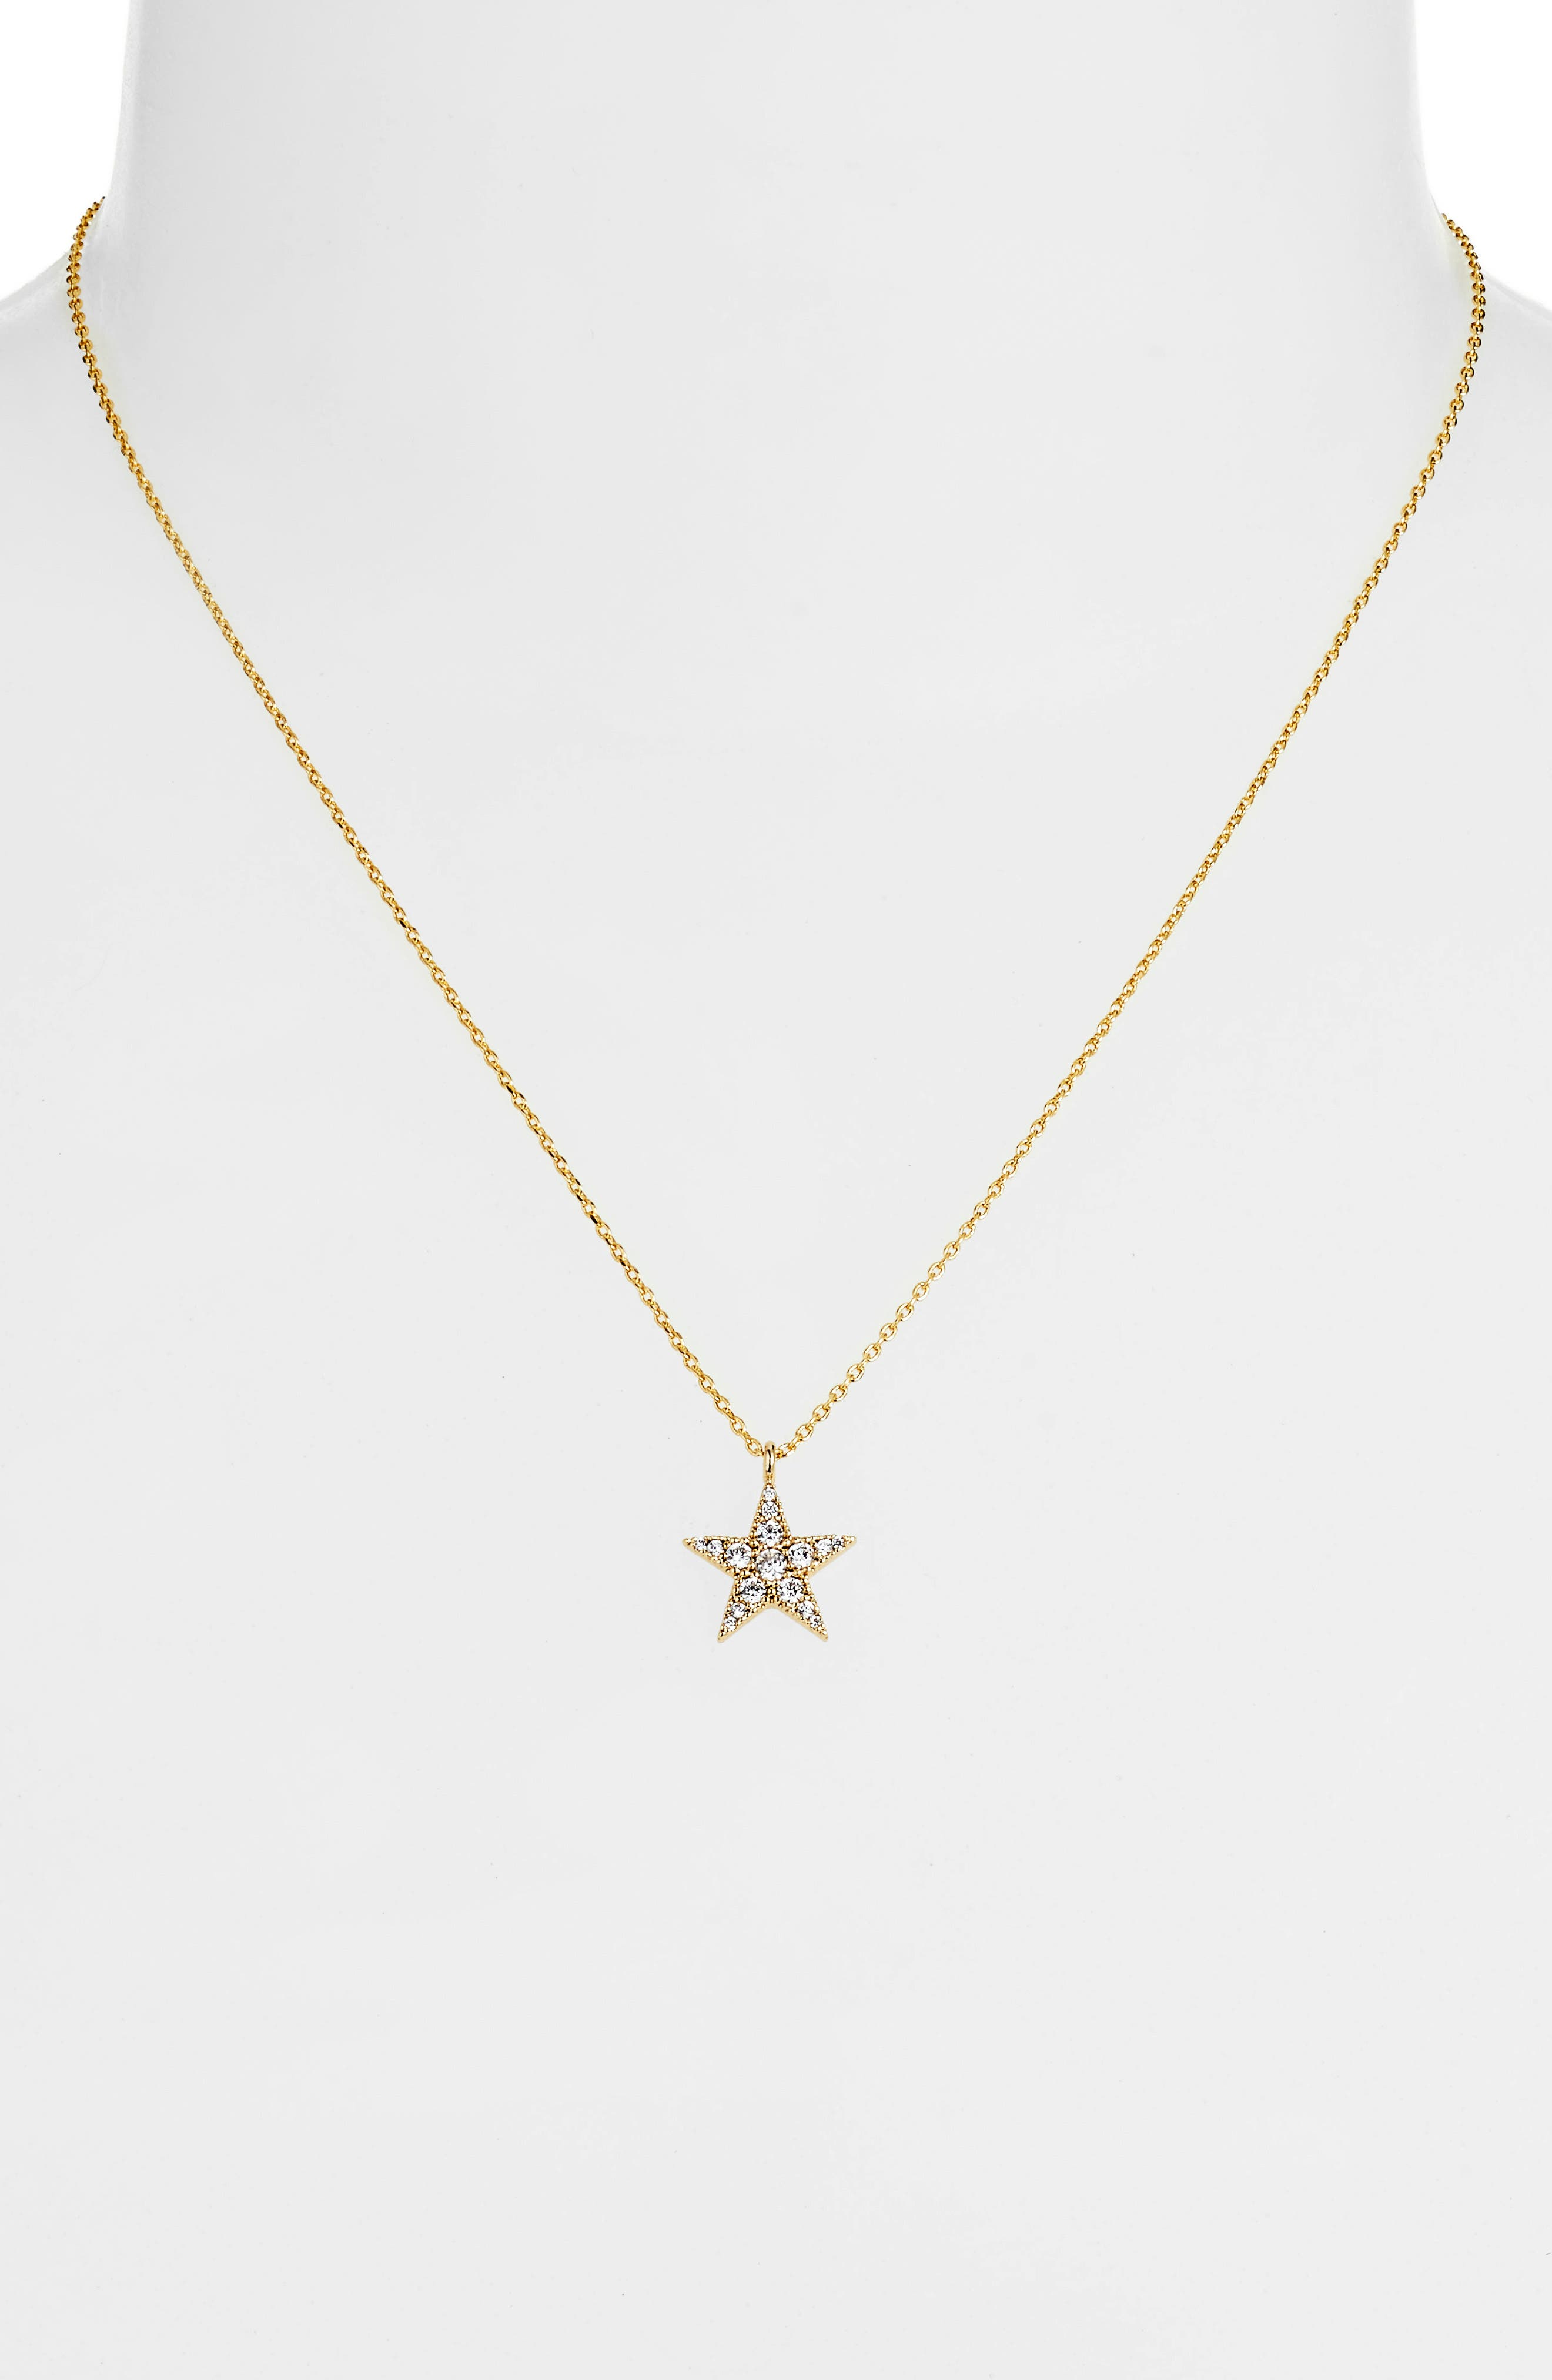 ESTELLA BARTLETT,                             Granulated Star Necklace,                             Alternate thumbnail 2, color,                             040